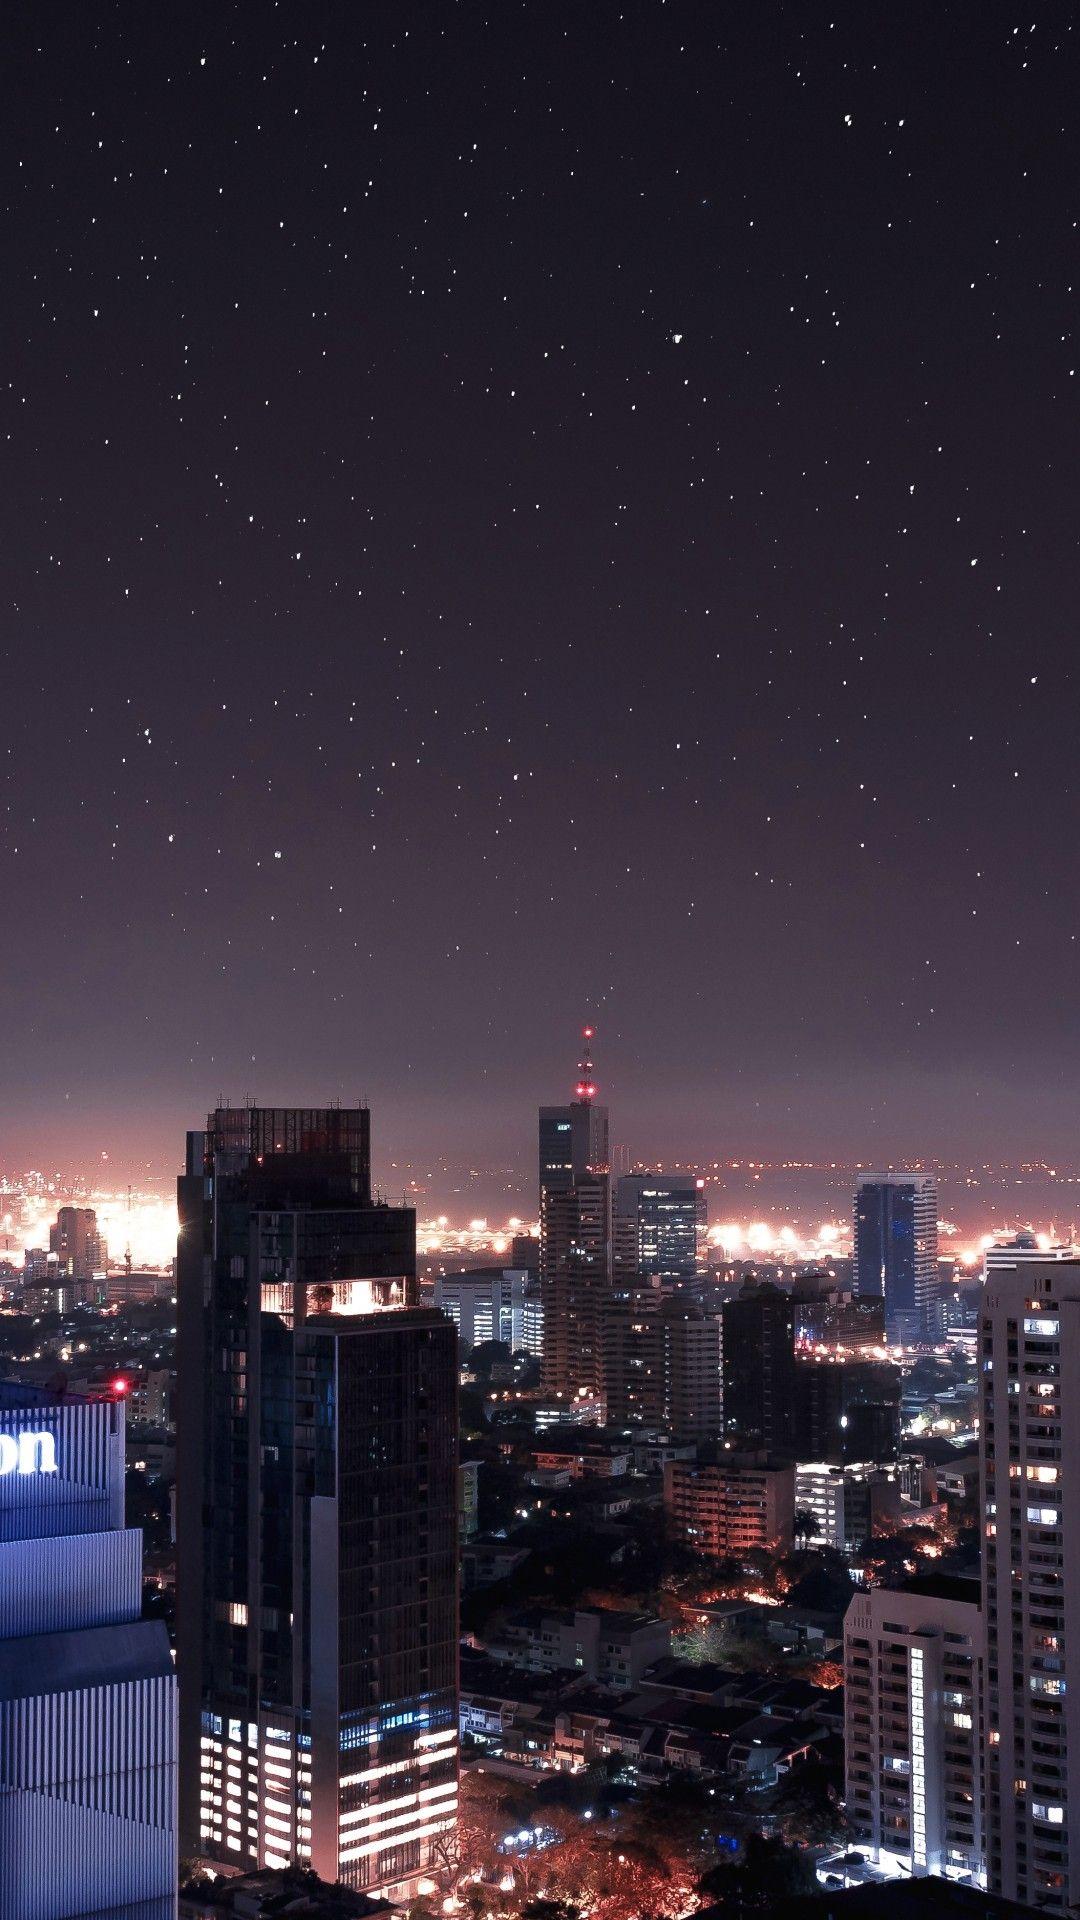 Night Stars Buildings Skyscrapers Cityscape Cityscape Wallpaper City Aesthetic Sky Aesthetic